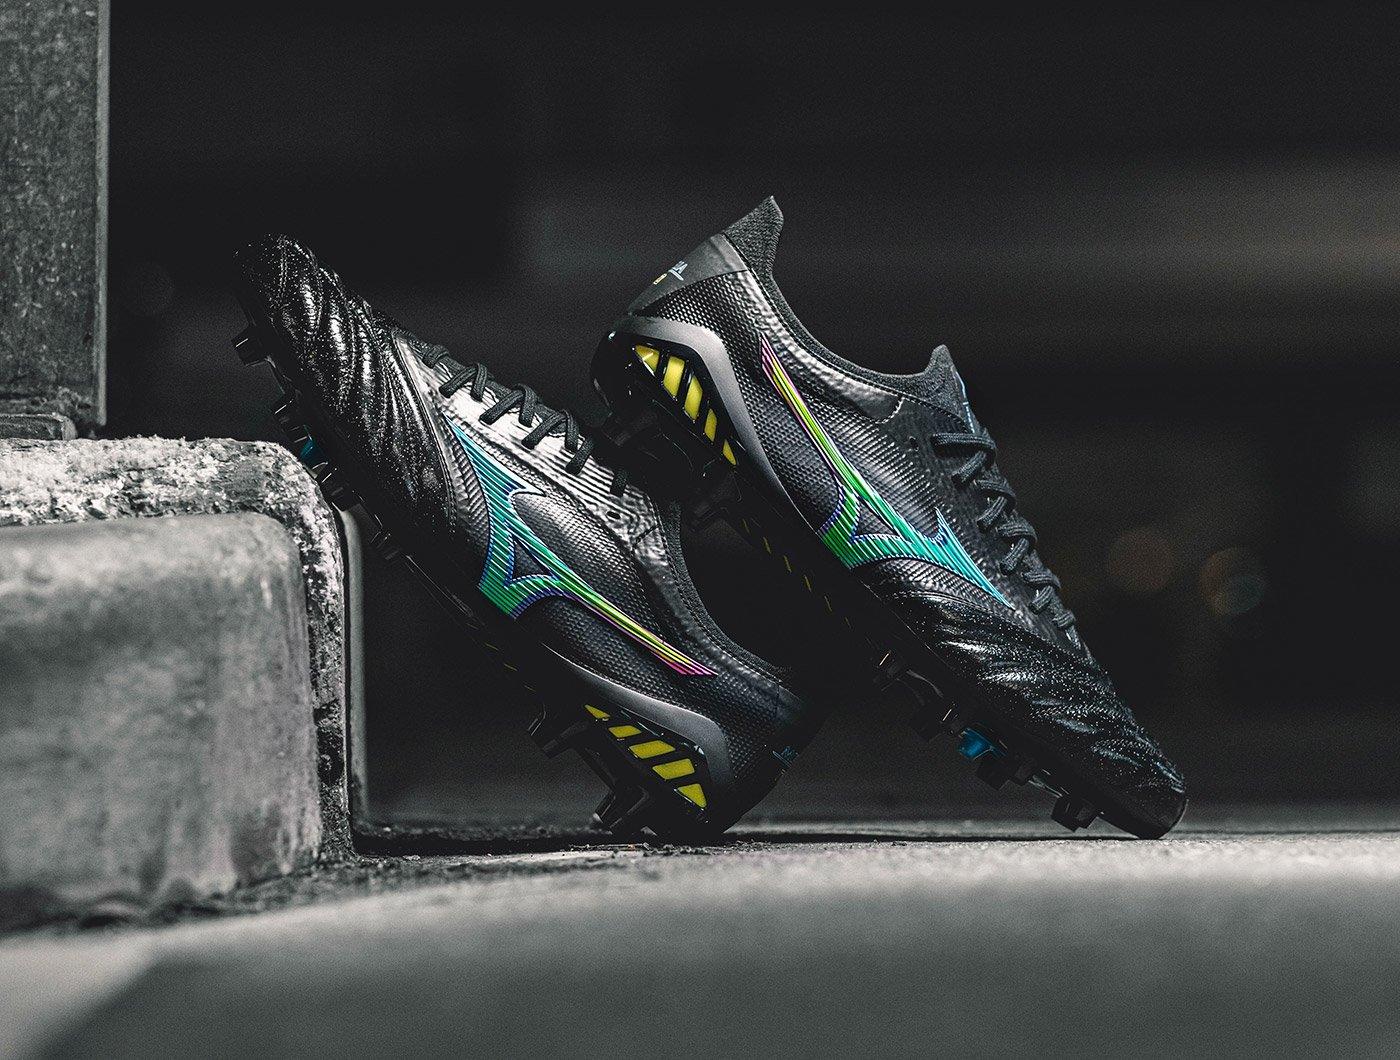 1157c1e1a Football Boots - Nike, adidas & New Balance Football Boots - Lovell ...